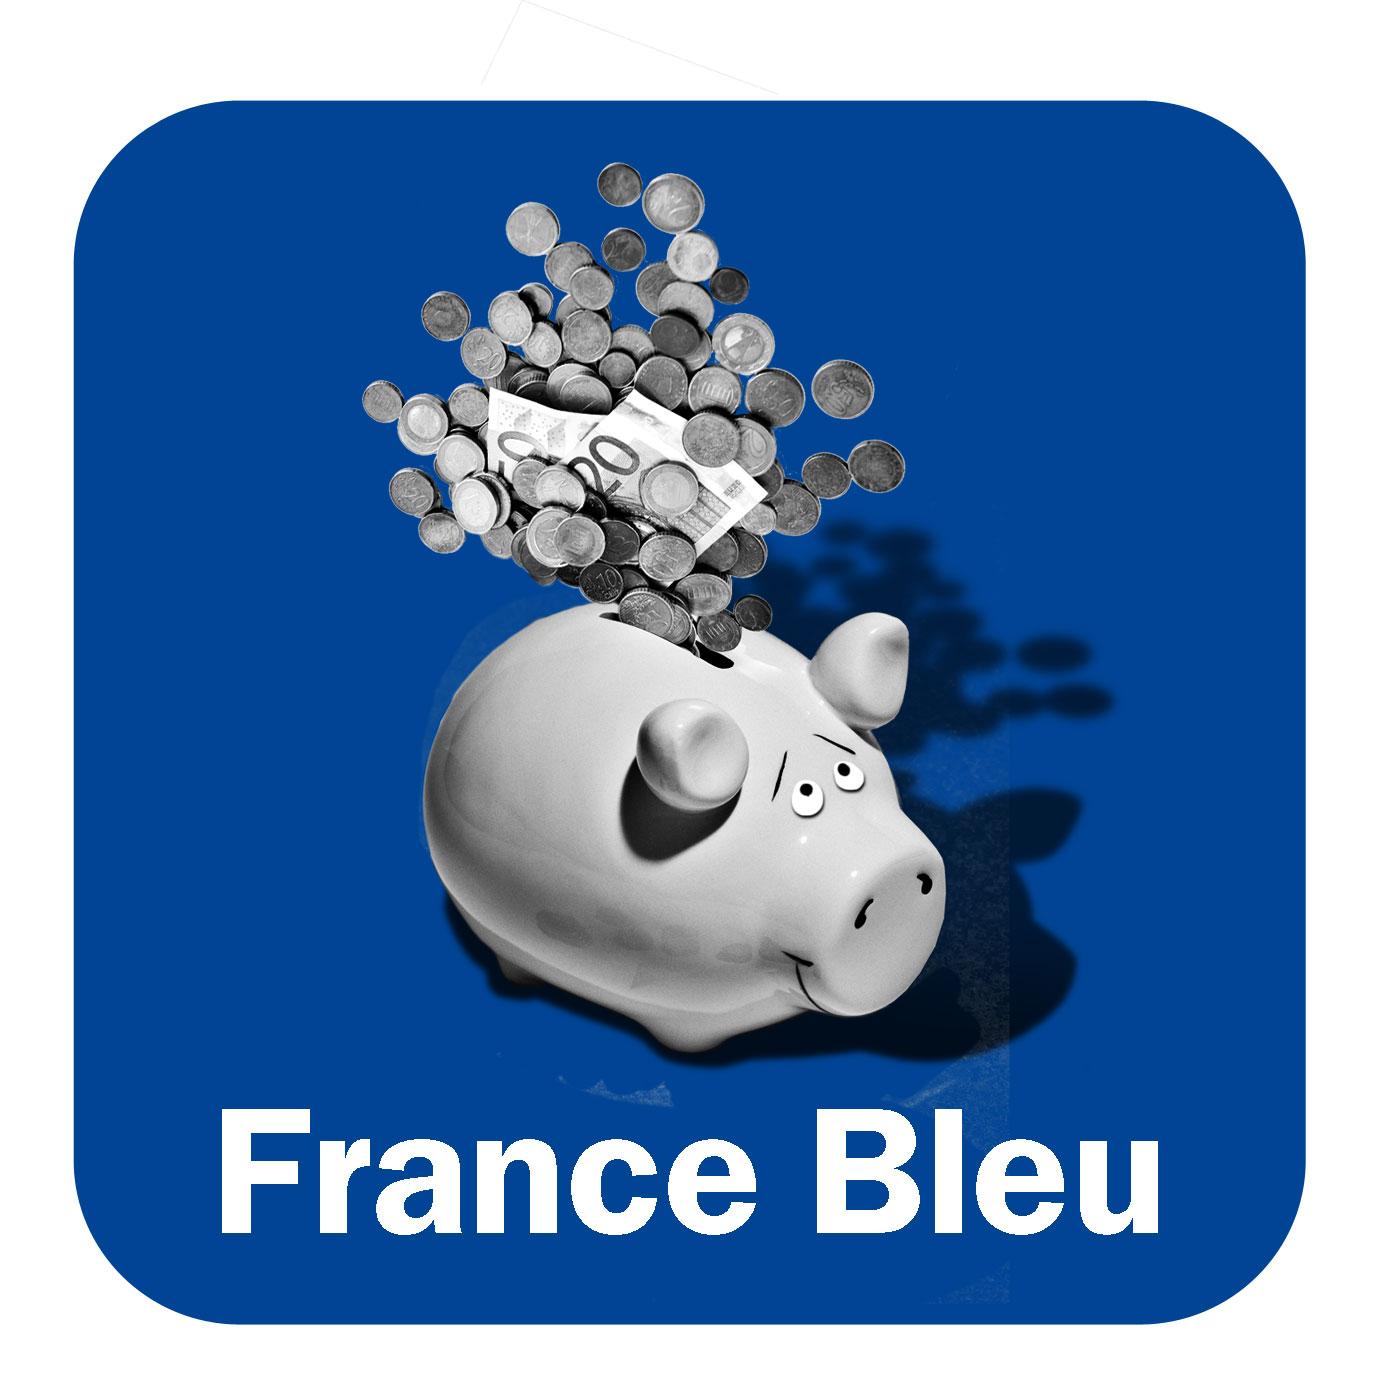 Objectif : emploi France Bleu Gironde